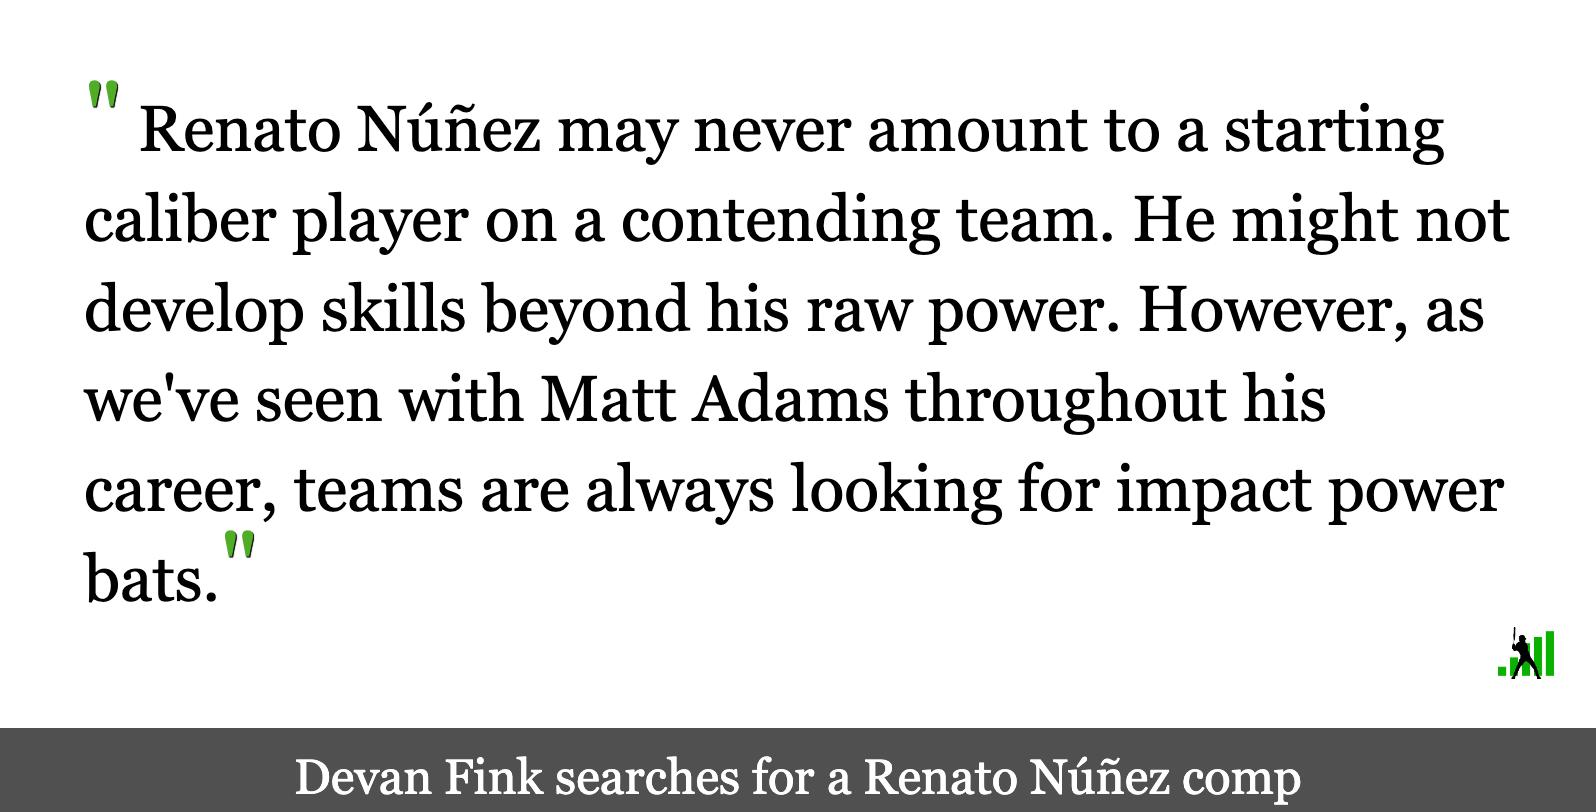 Finding a Beltway Baseball Comp for Renato Núñez